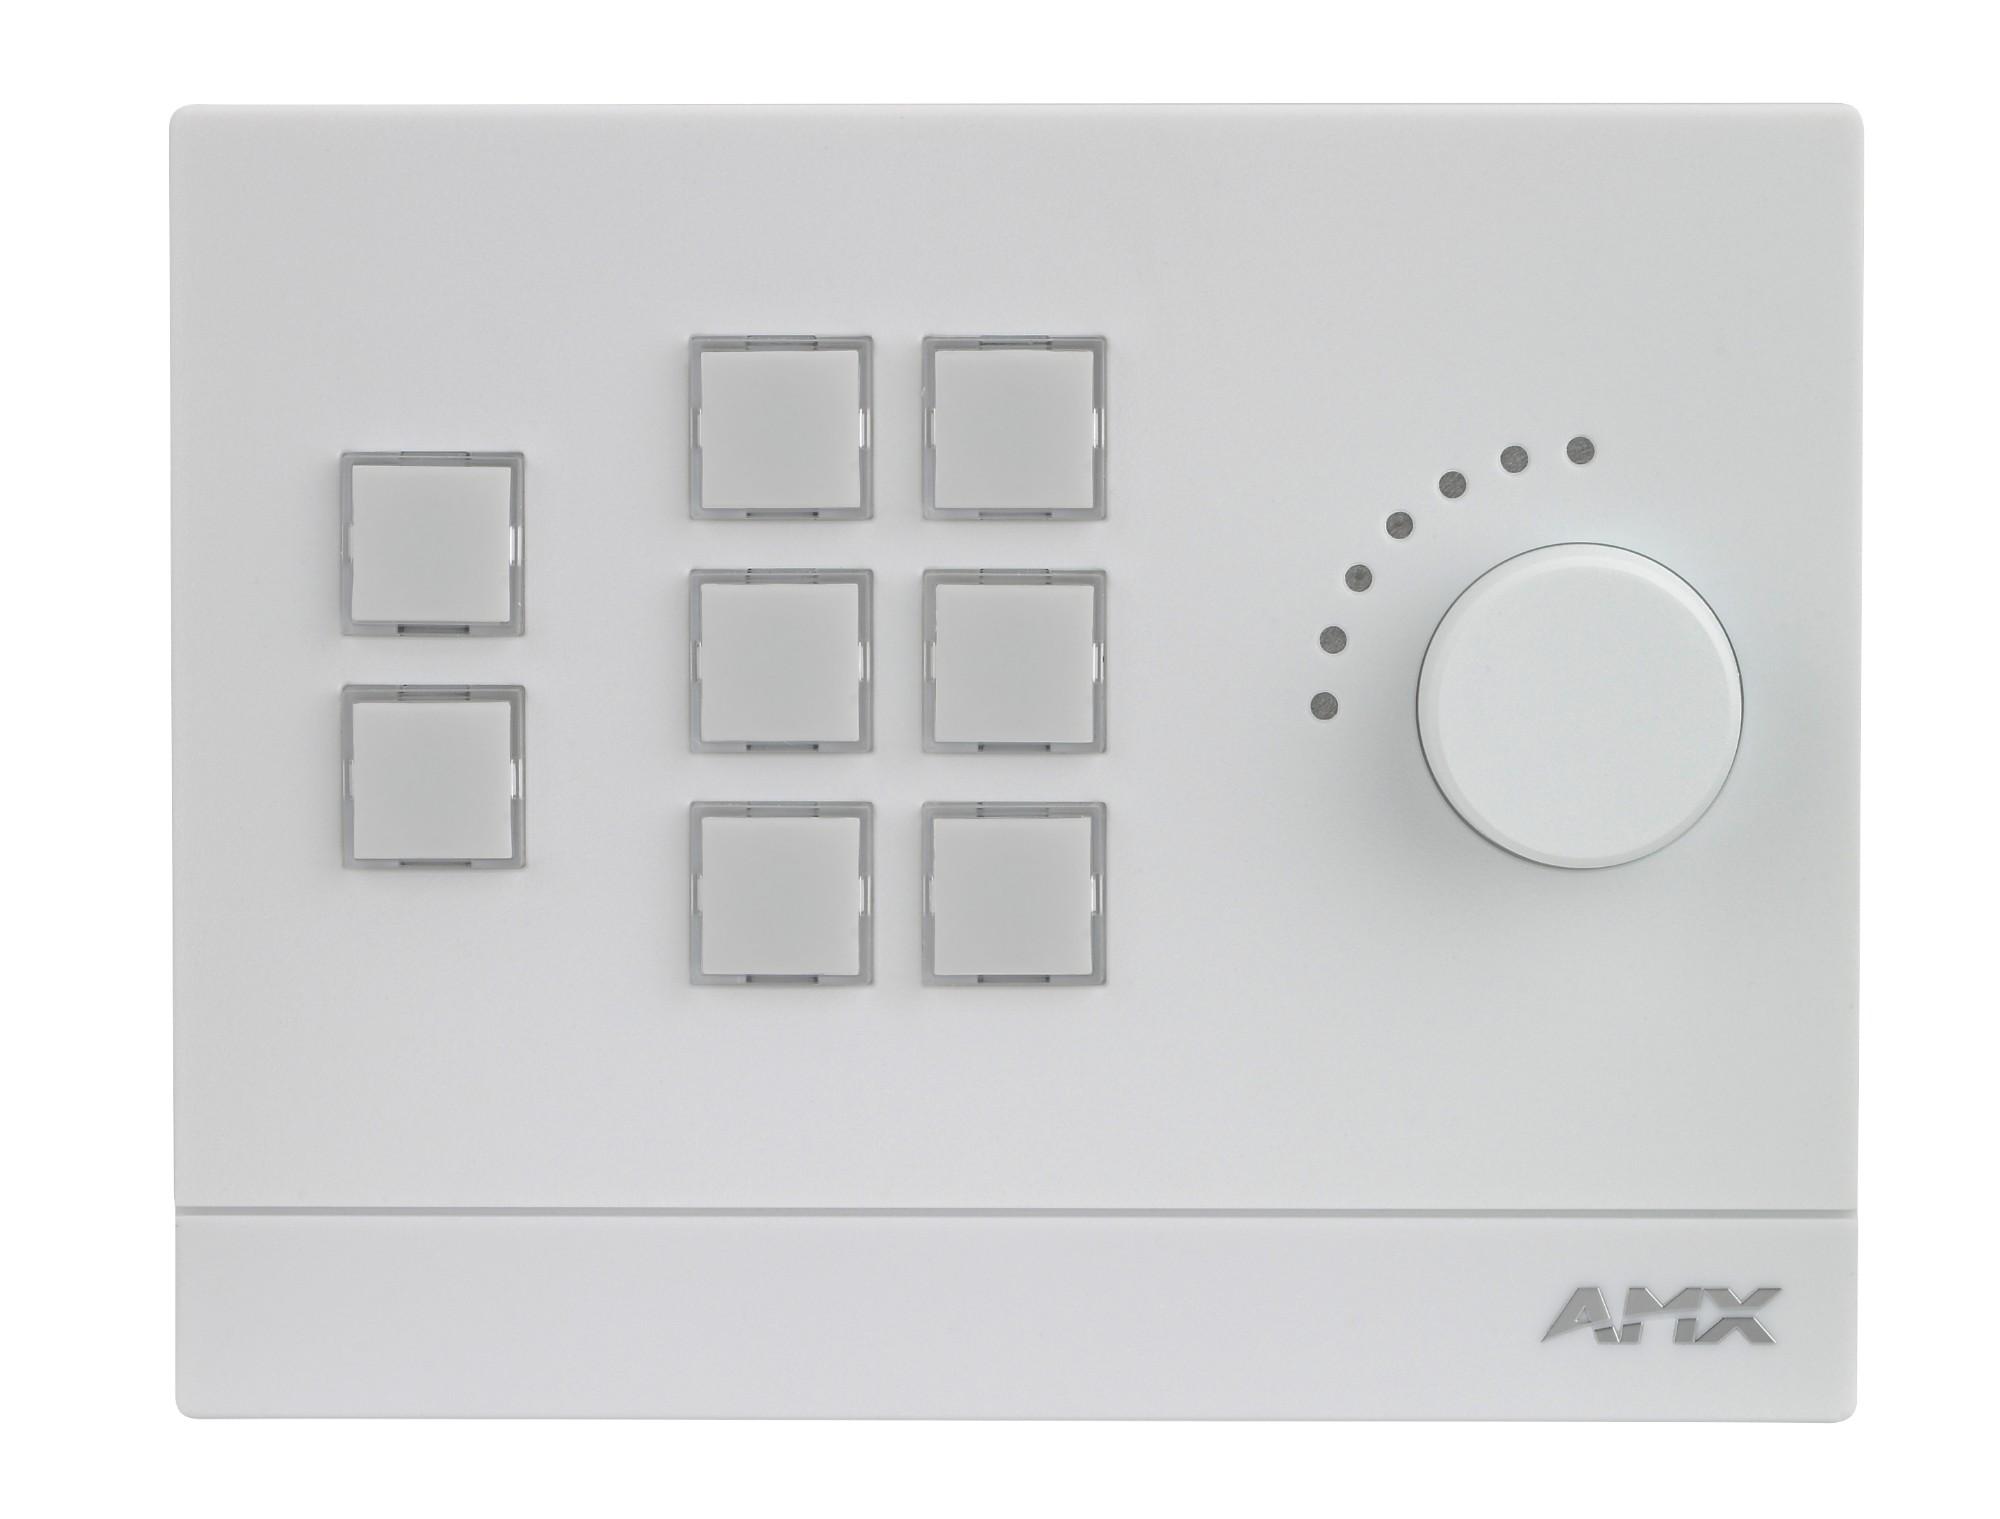 AMX FG2102-08-W White push-button panel